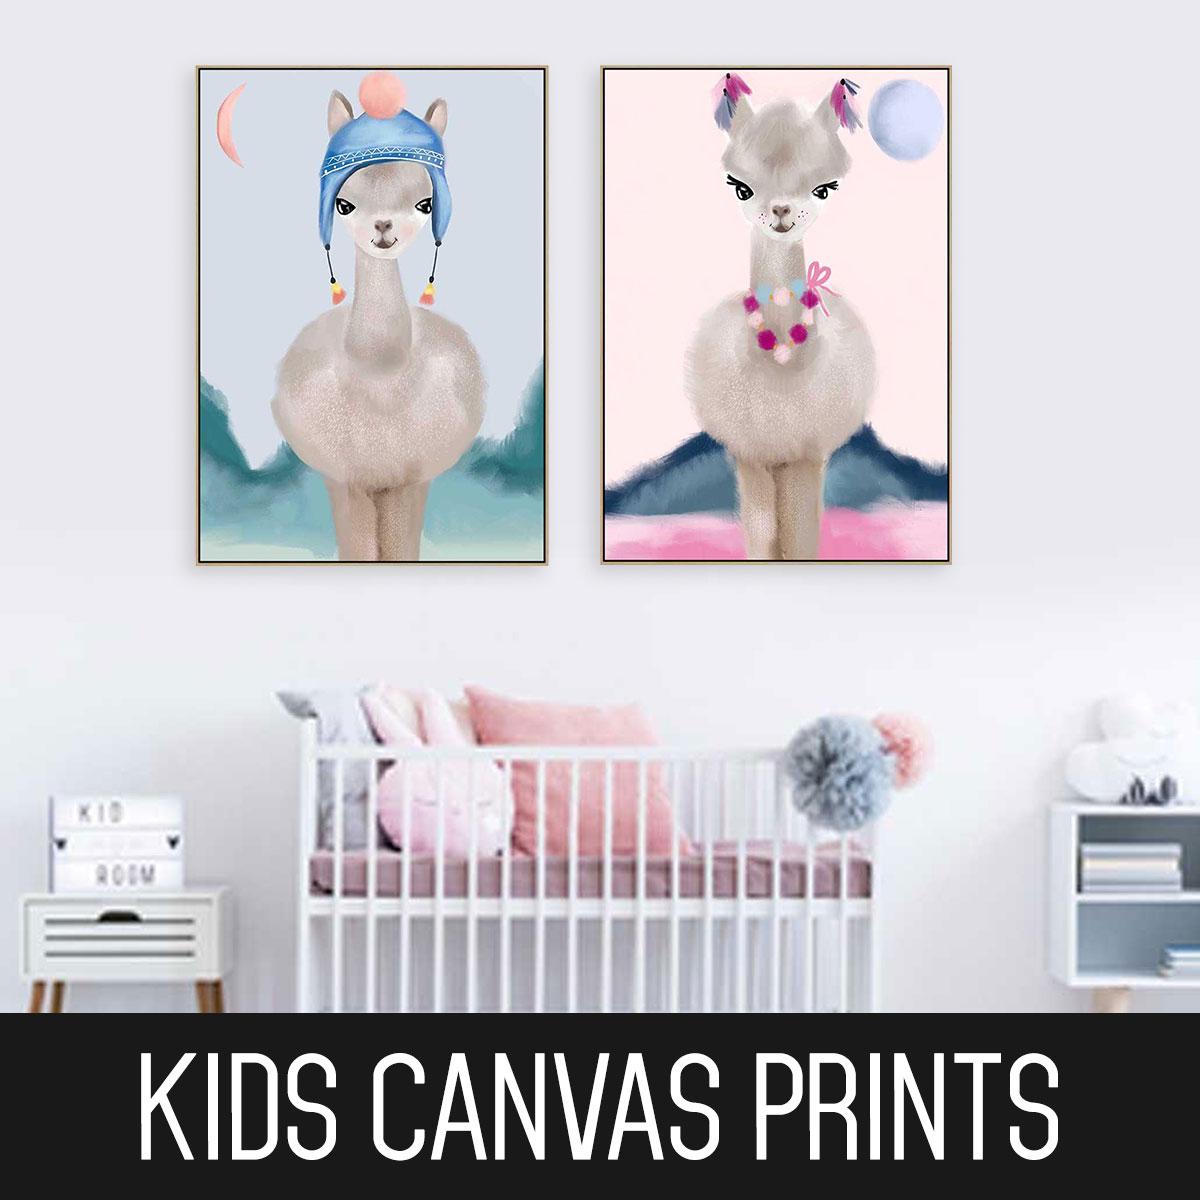 Childrens Canvas Prints